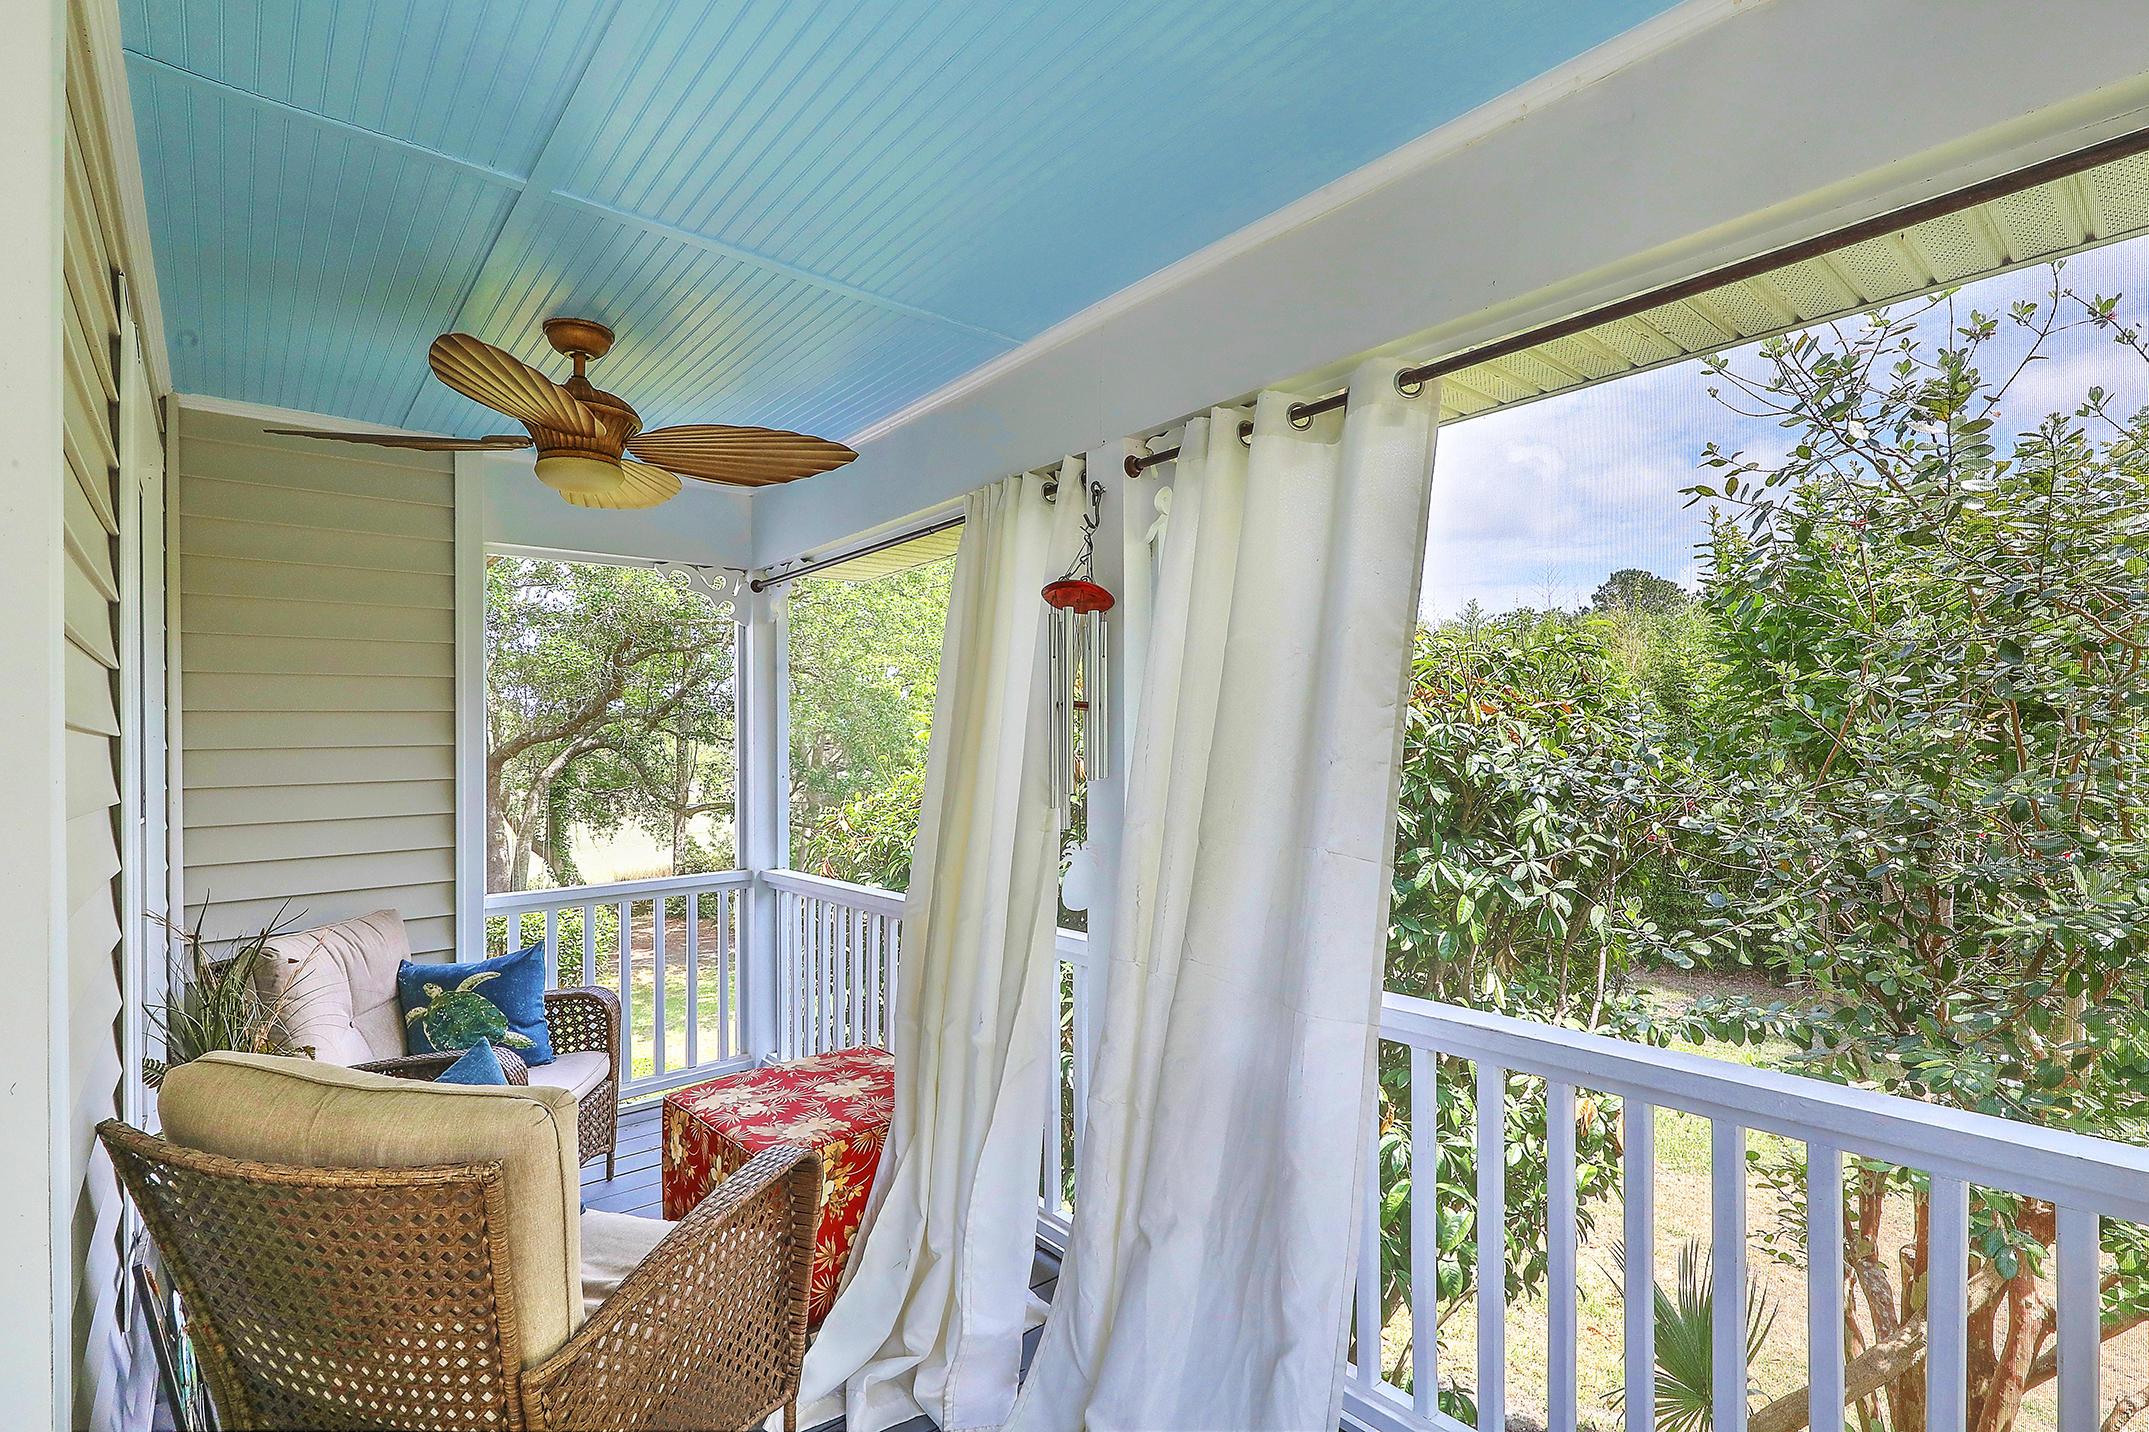 Stono Pointe Homes For Sale - 2660 Burden Creek, Johns Island, SC - 54